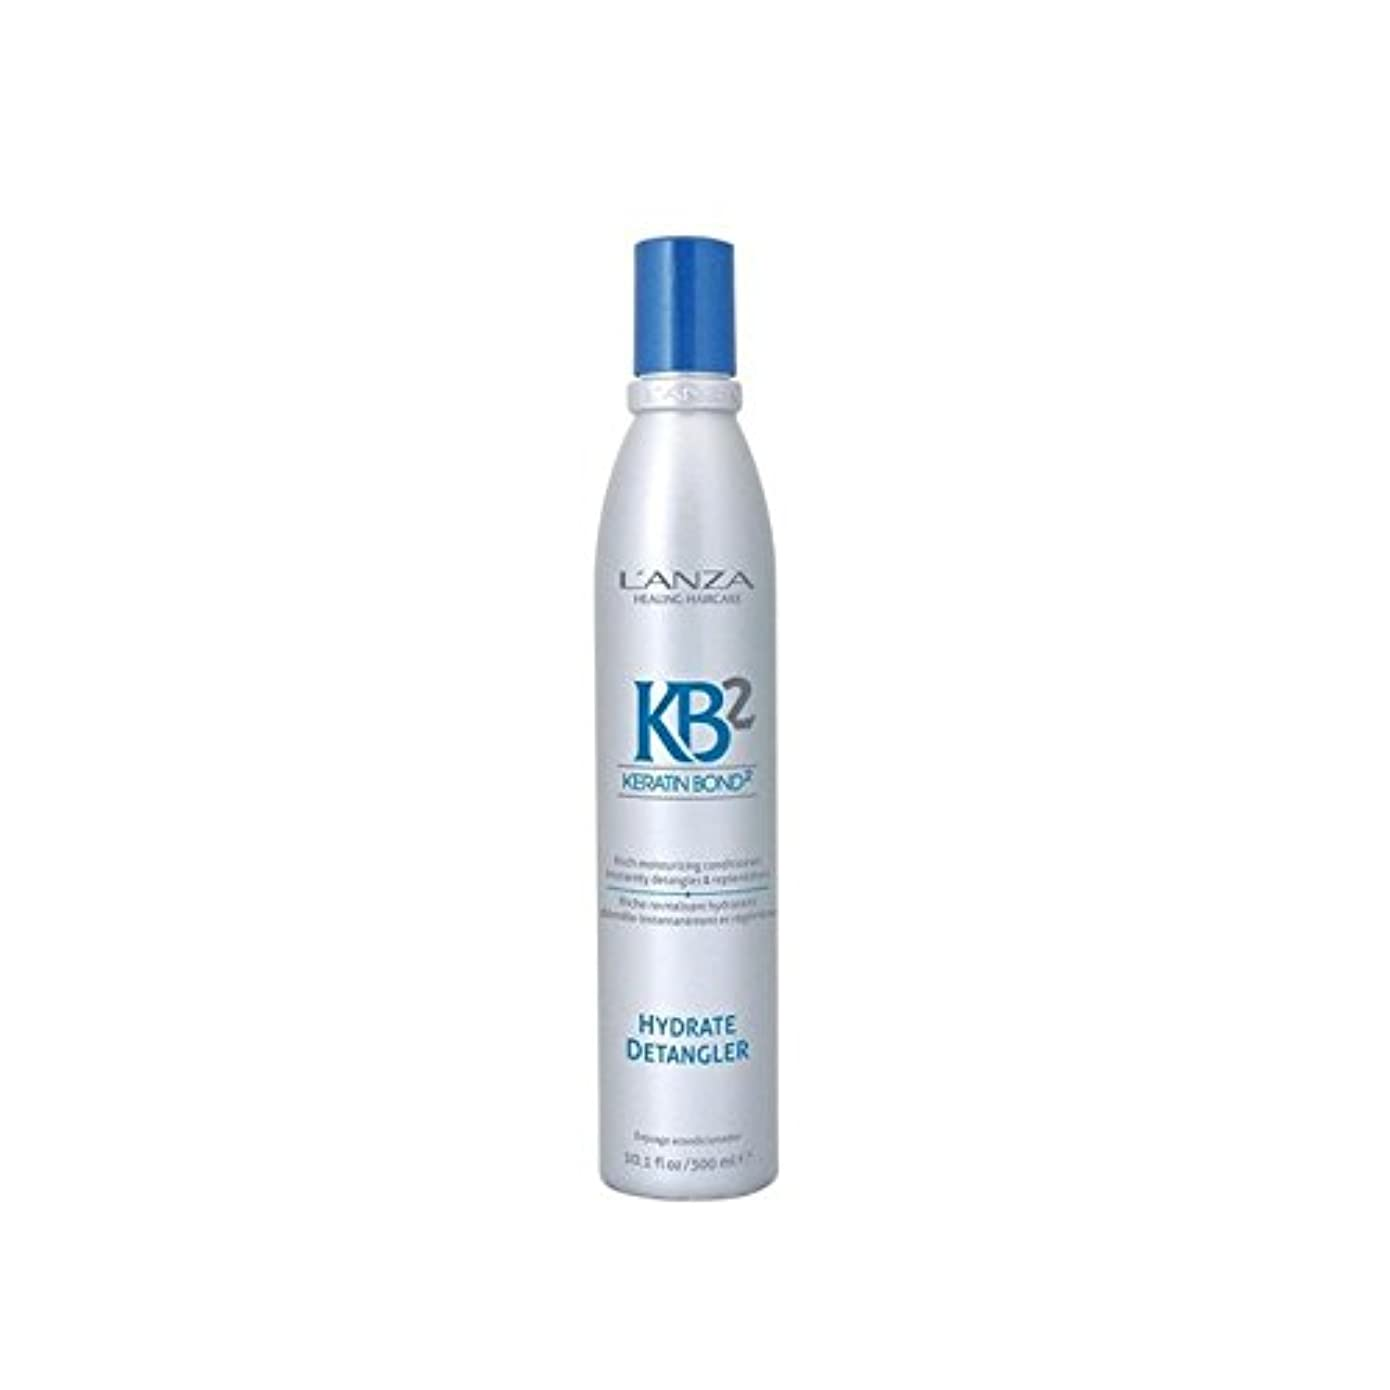 L'Anza Kb2 Hydrate Detangler (300ml) - アンザ2和物(300ミリリットル) [並行輸入品]